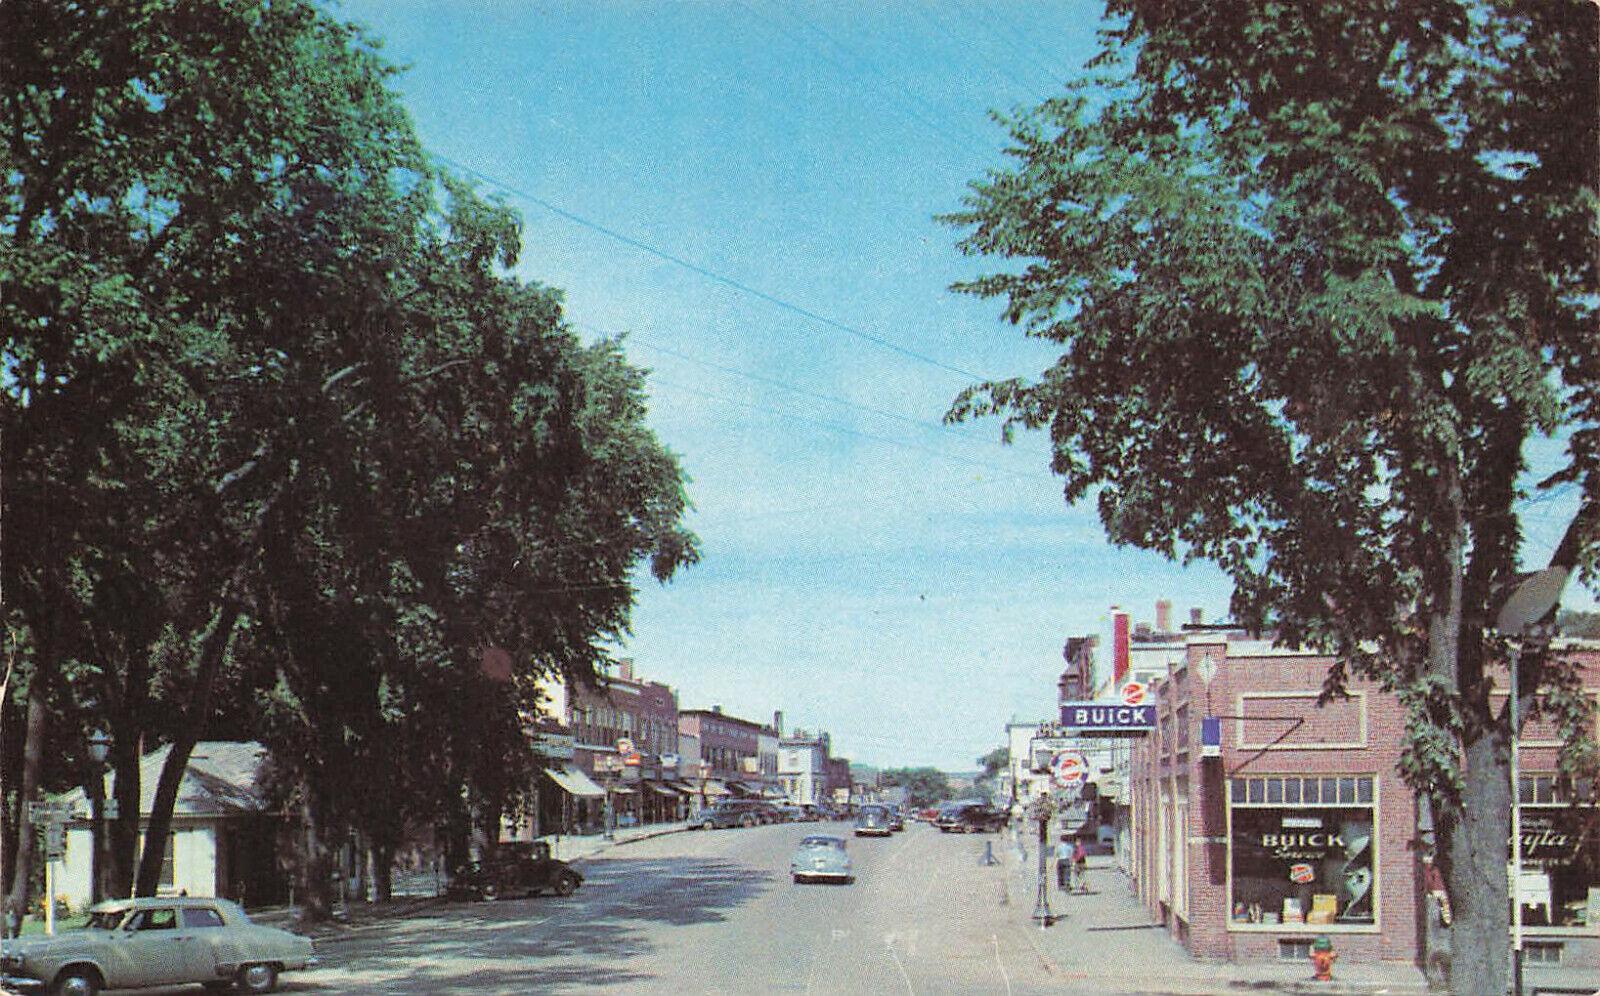 Image 1 - Presque Isle ME Buick Dealership Postcard